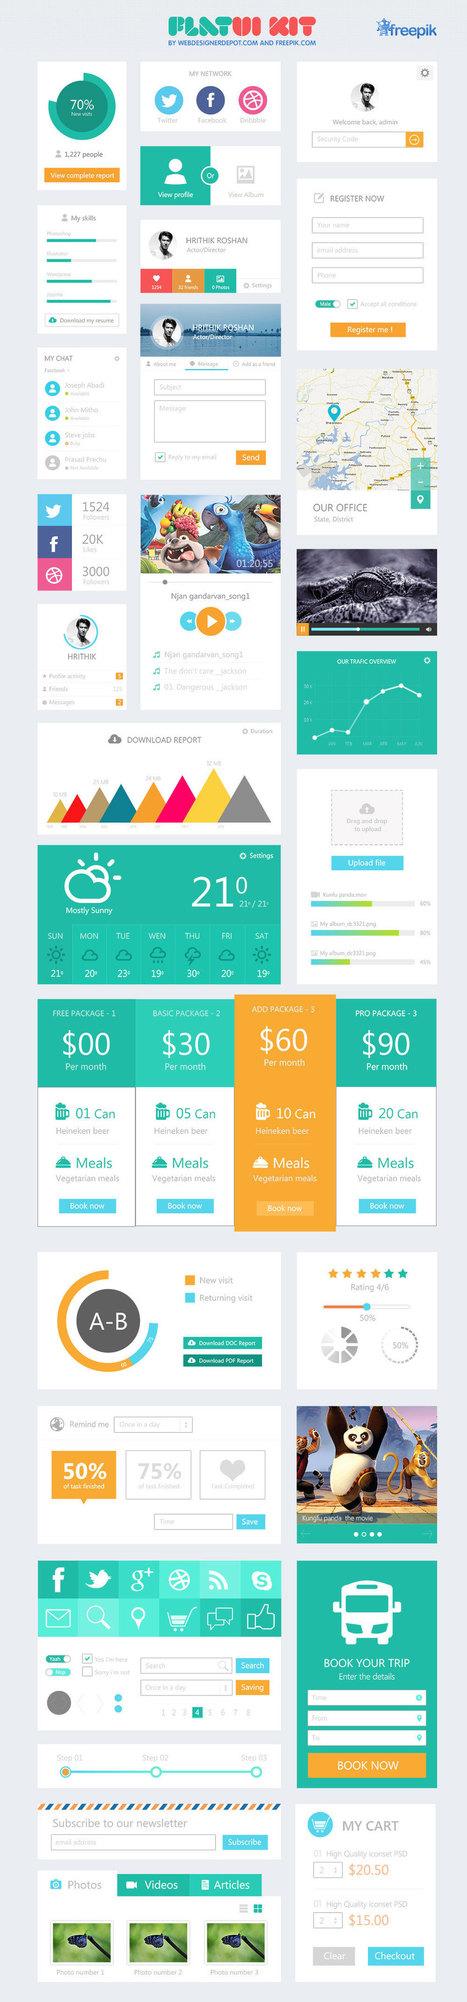 Flat UI Kit (free download!)   Website Graphic Design, UI and UX   Scoop.it